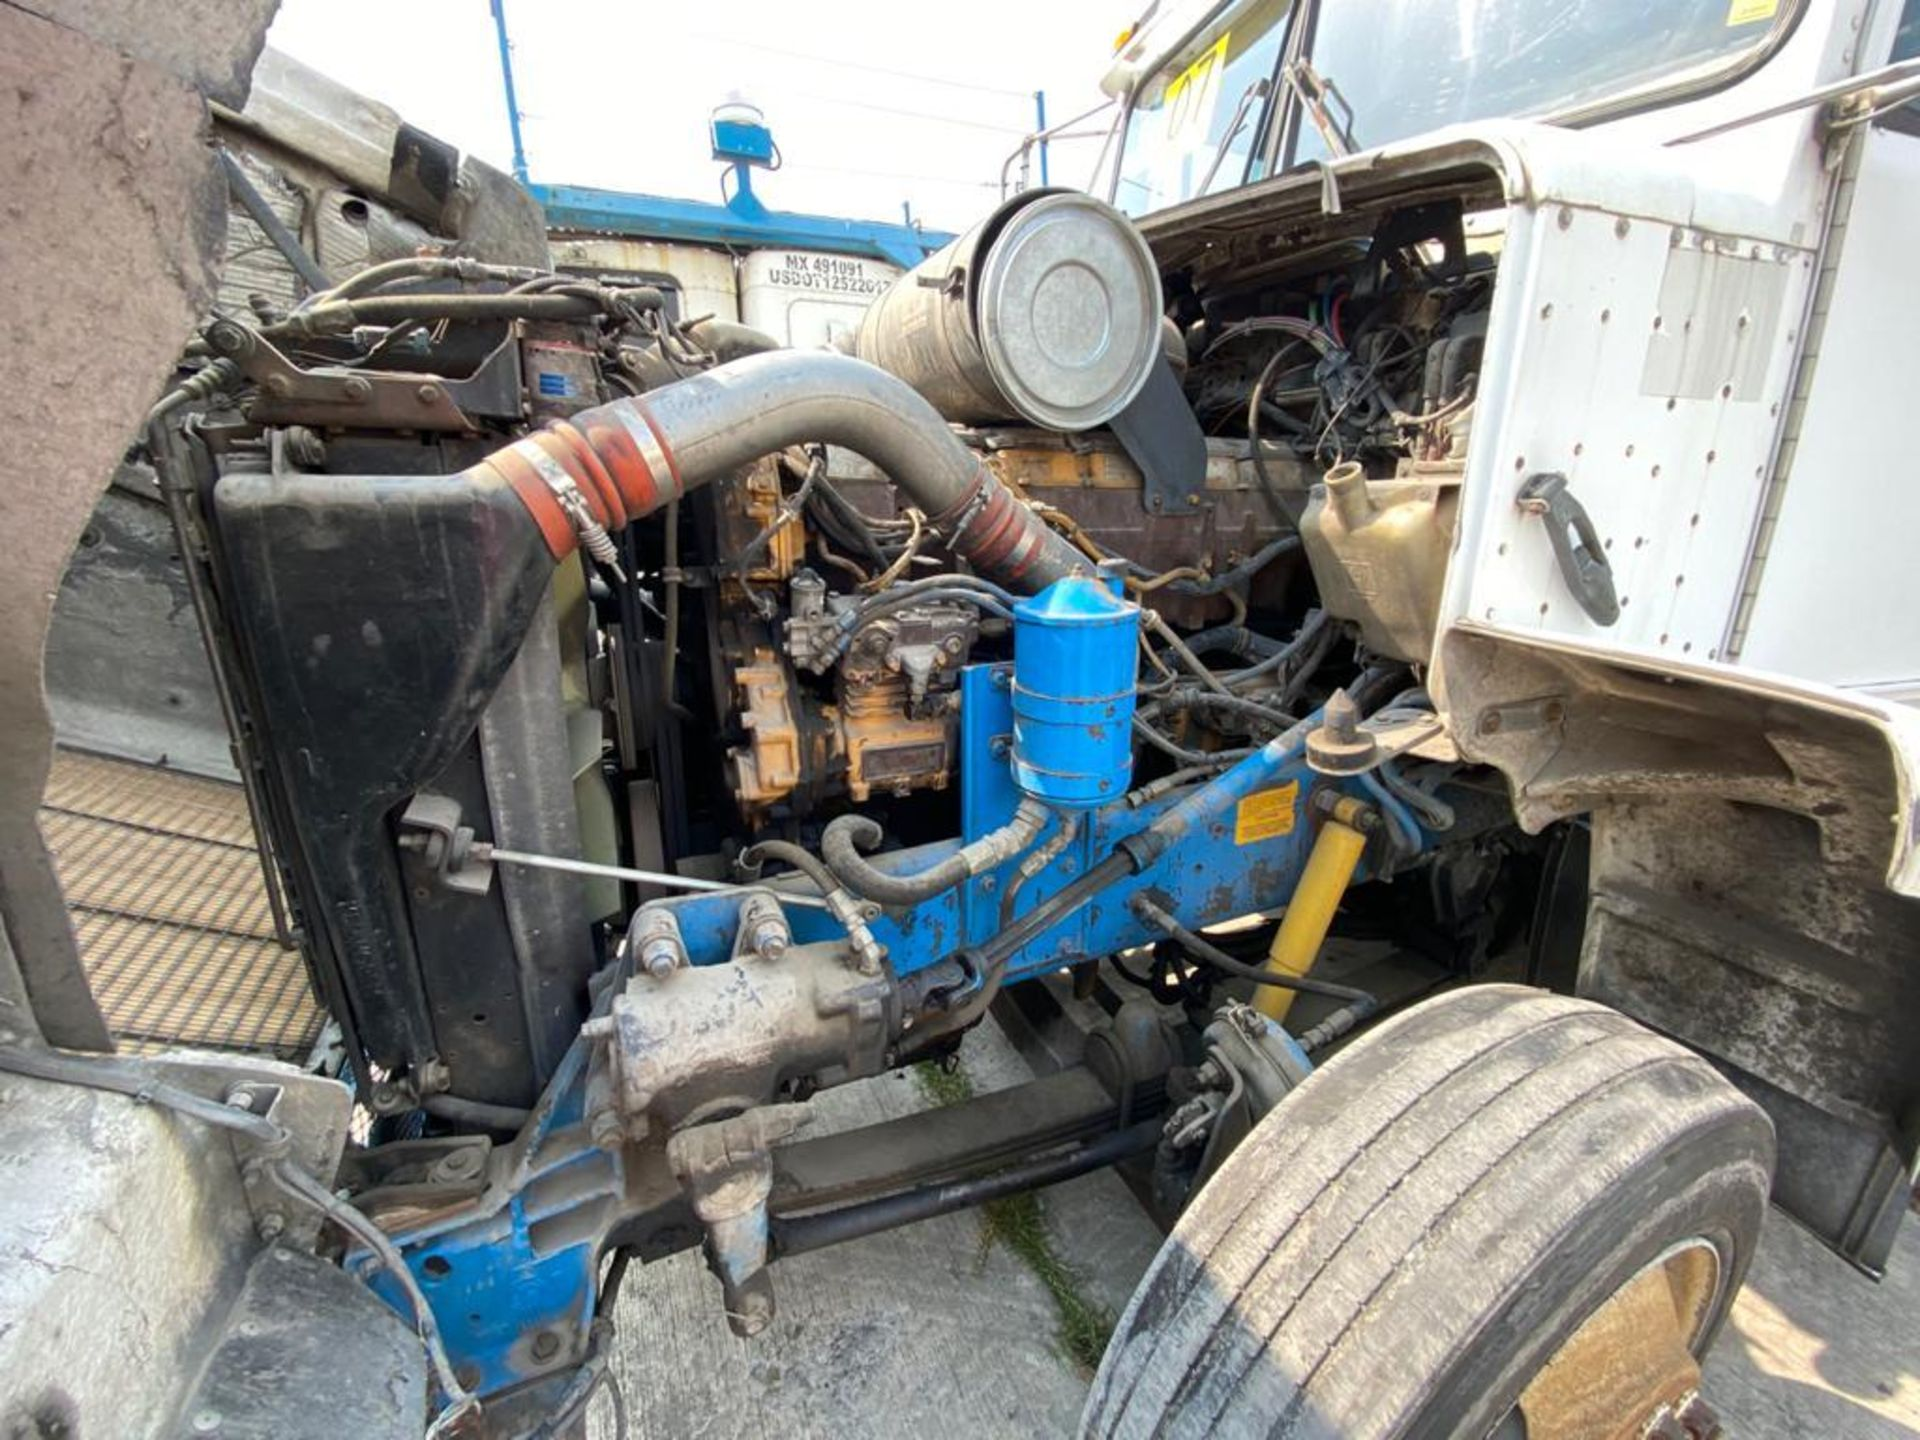 1999 Kenworth Sleeper truck tractor, standard transmission of 18 speeds - Image 59 of 72